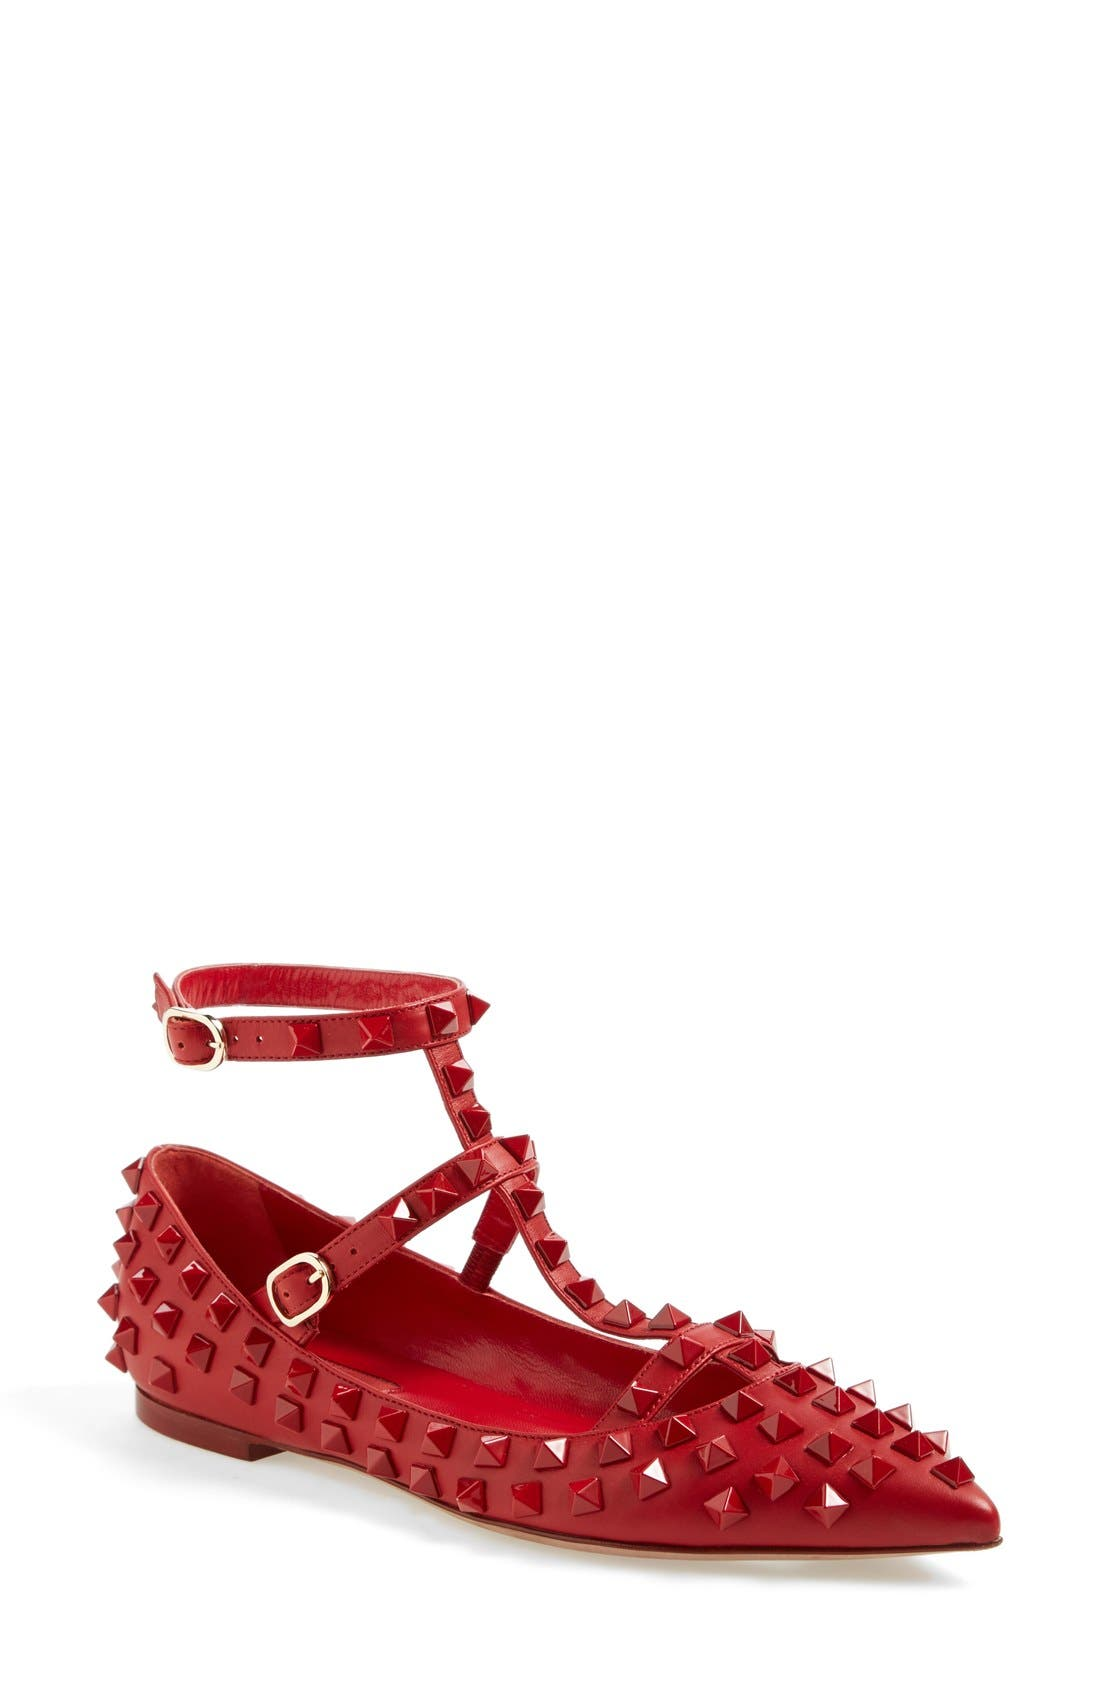 Main Image - VALENTINO GARAVANI 'Rockstud' T-Strap Pointy Toe Flat (Women)